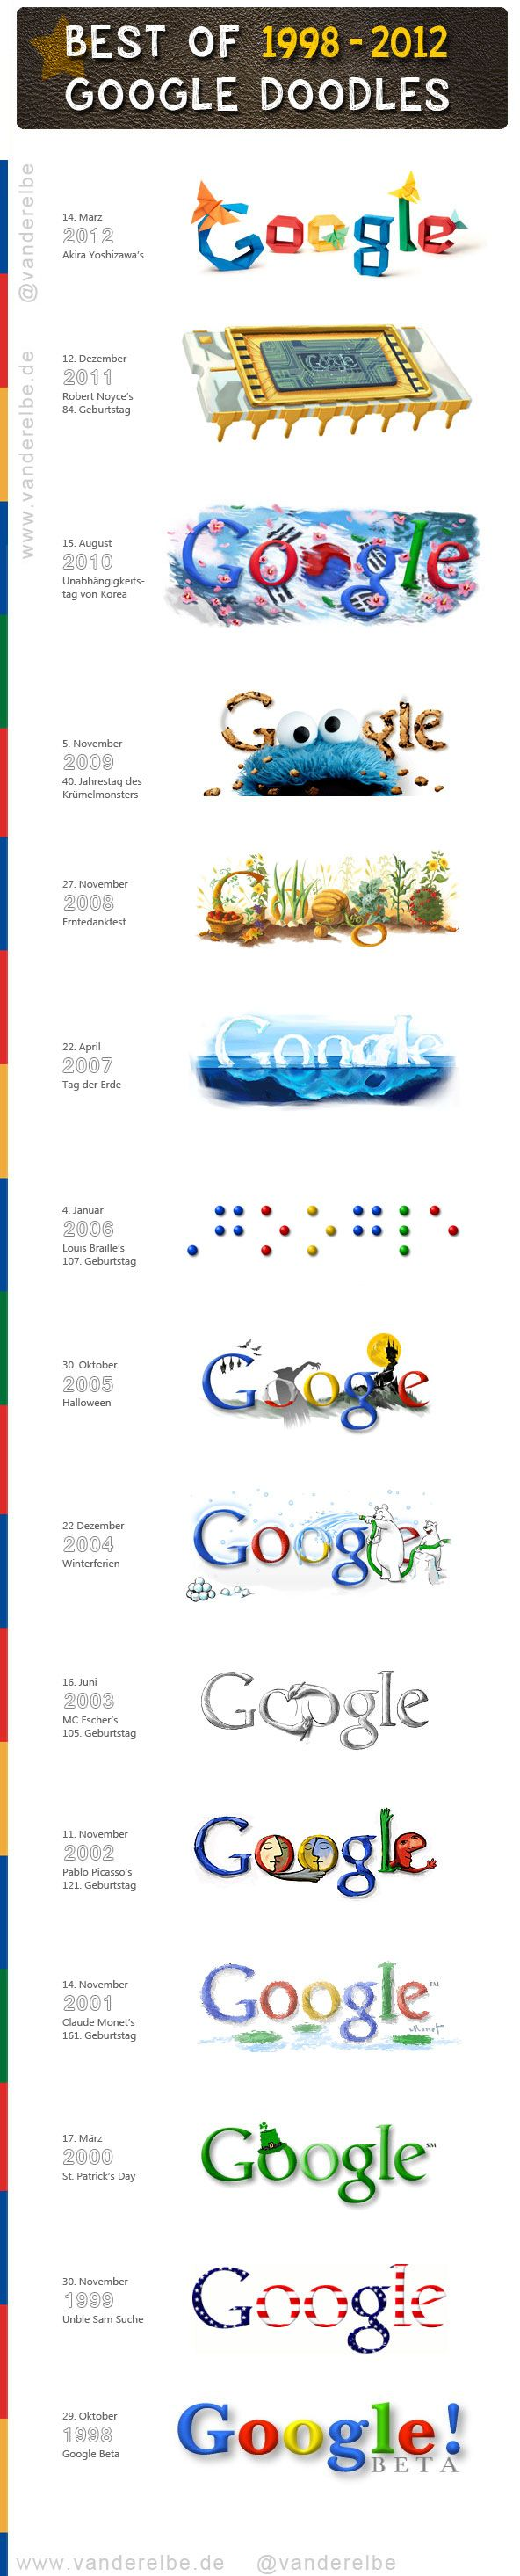 Best Of Google Doodles 1998-2012 #infografphic // Los mejores Doodles de Google 1998-2012 # (repinned by @For Your Assistance)